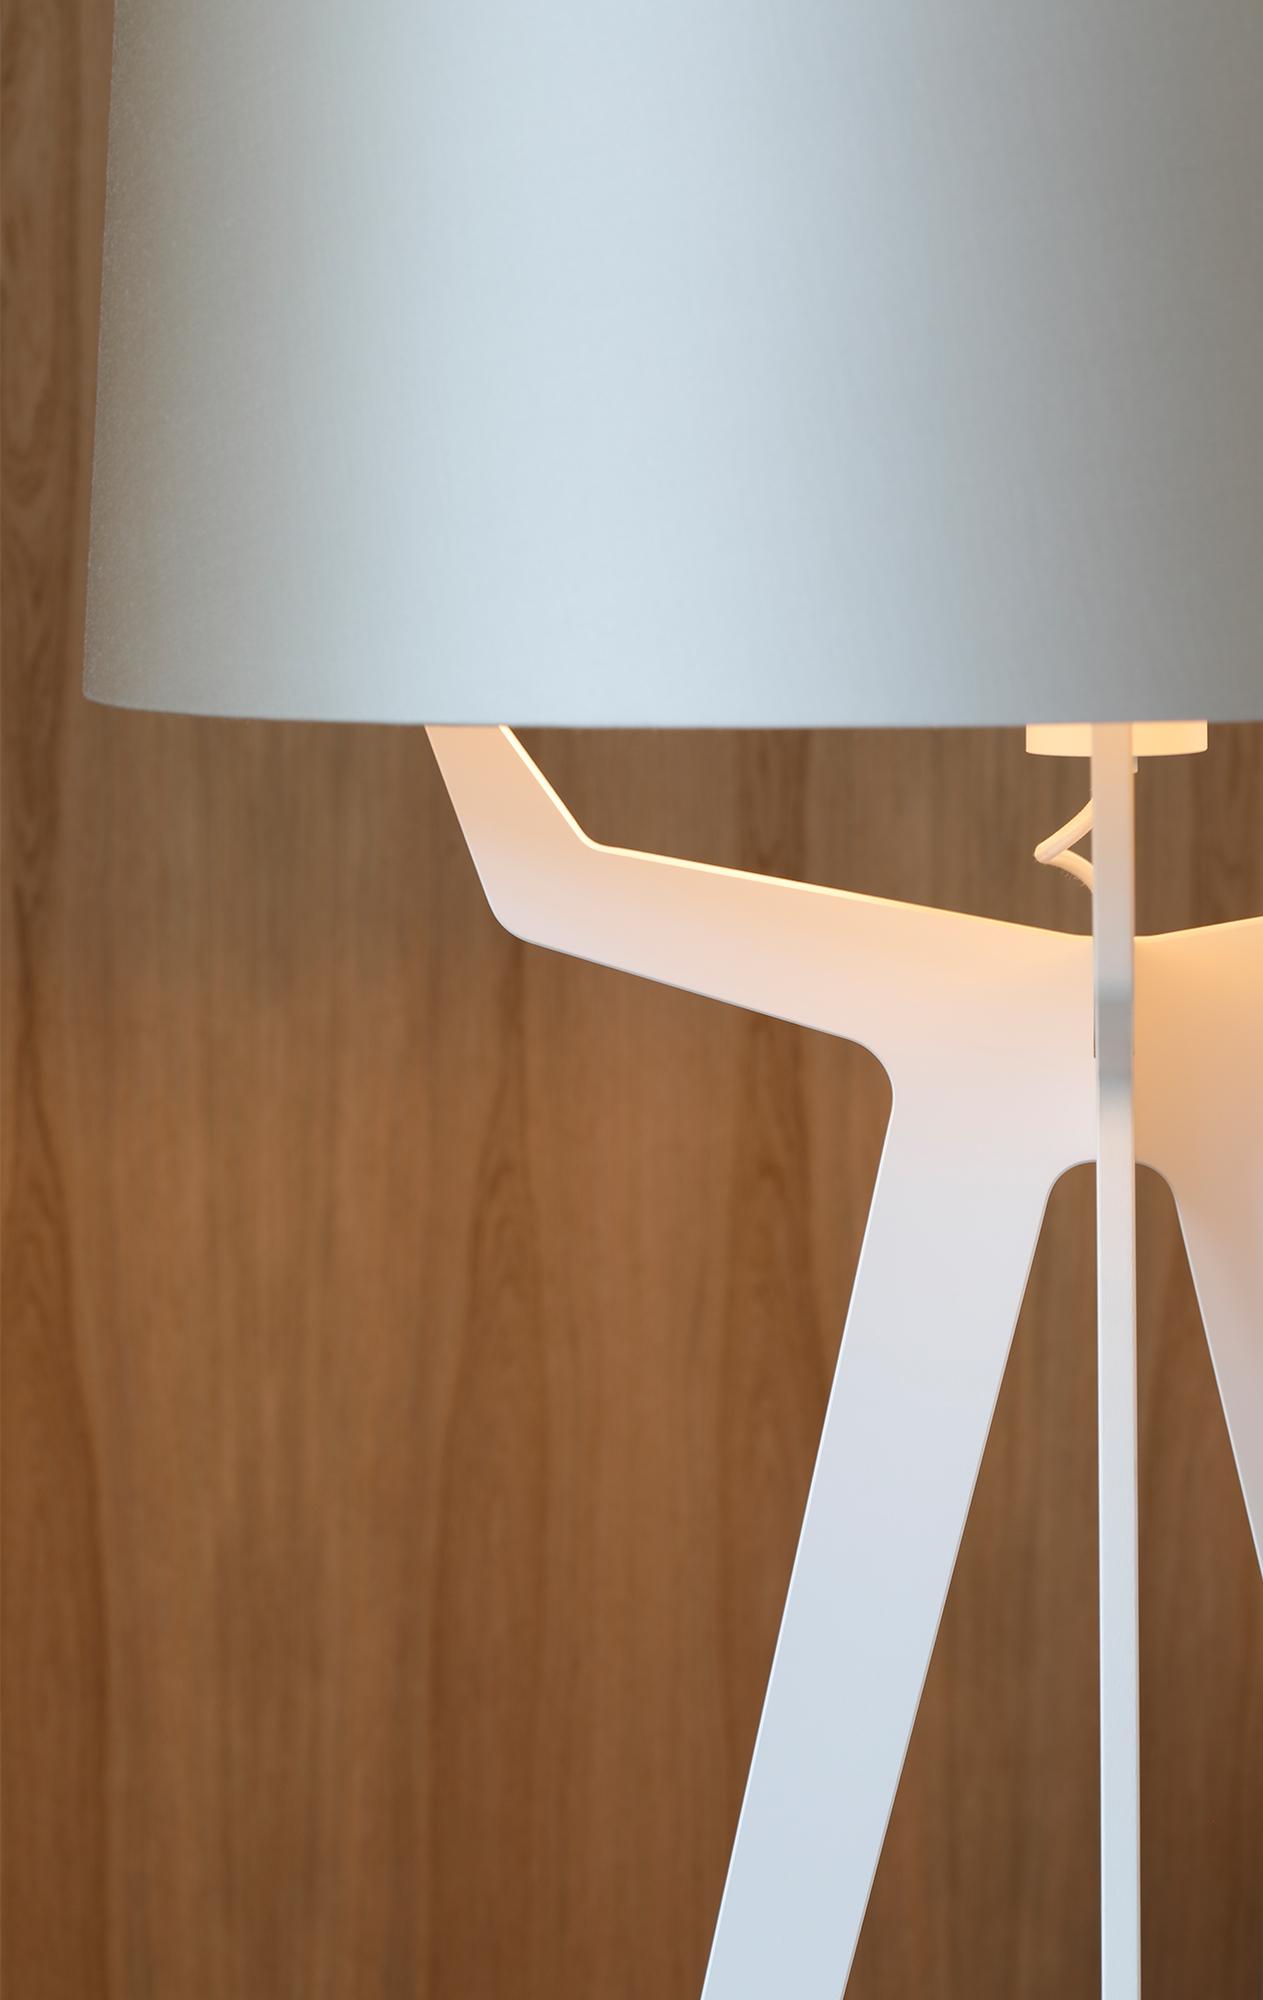 Balada_fenix_white_impessionen_closeup_fenix_white_no35_xl_floor_lamp_lights_on_image1_001